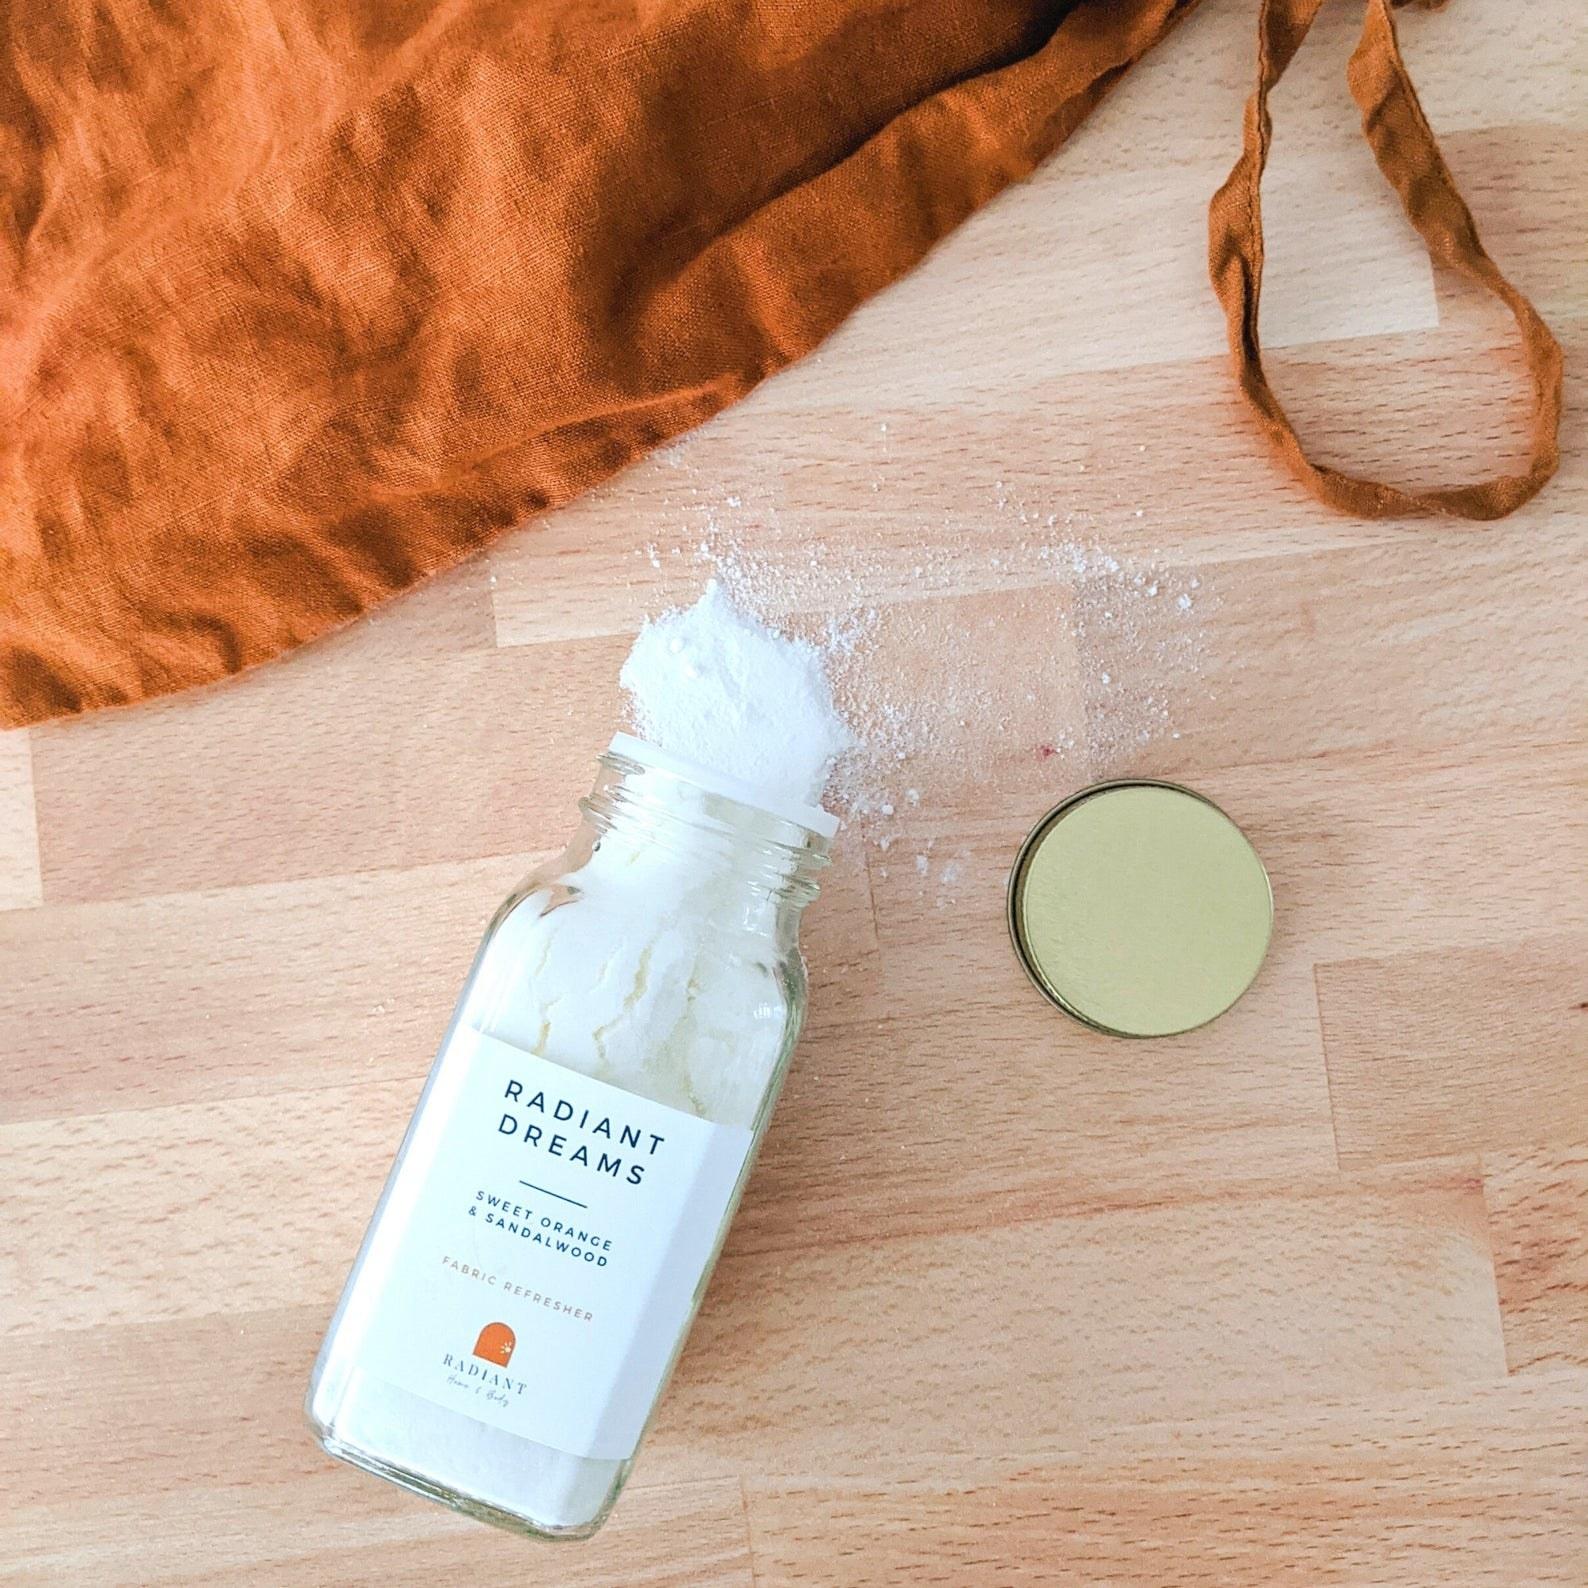 The bottle of white freshening powder